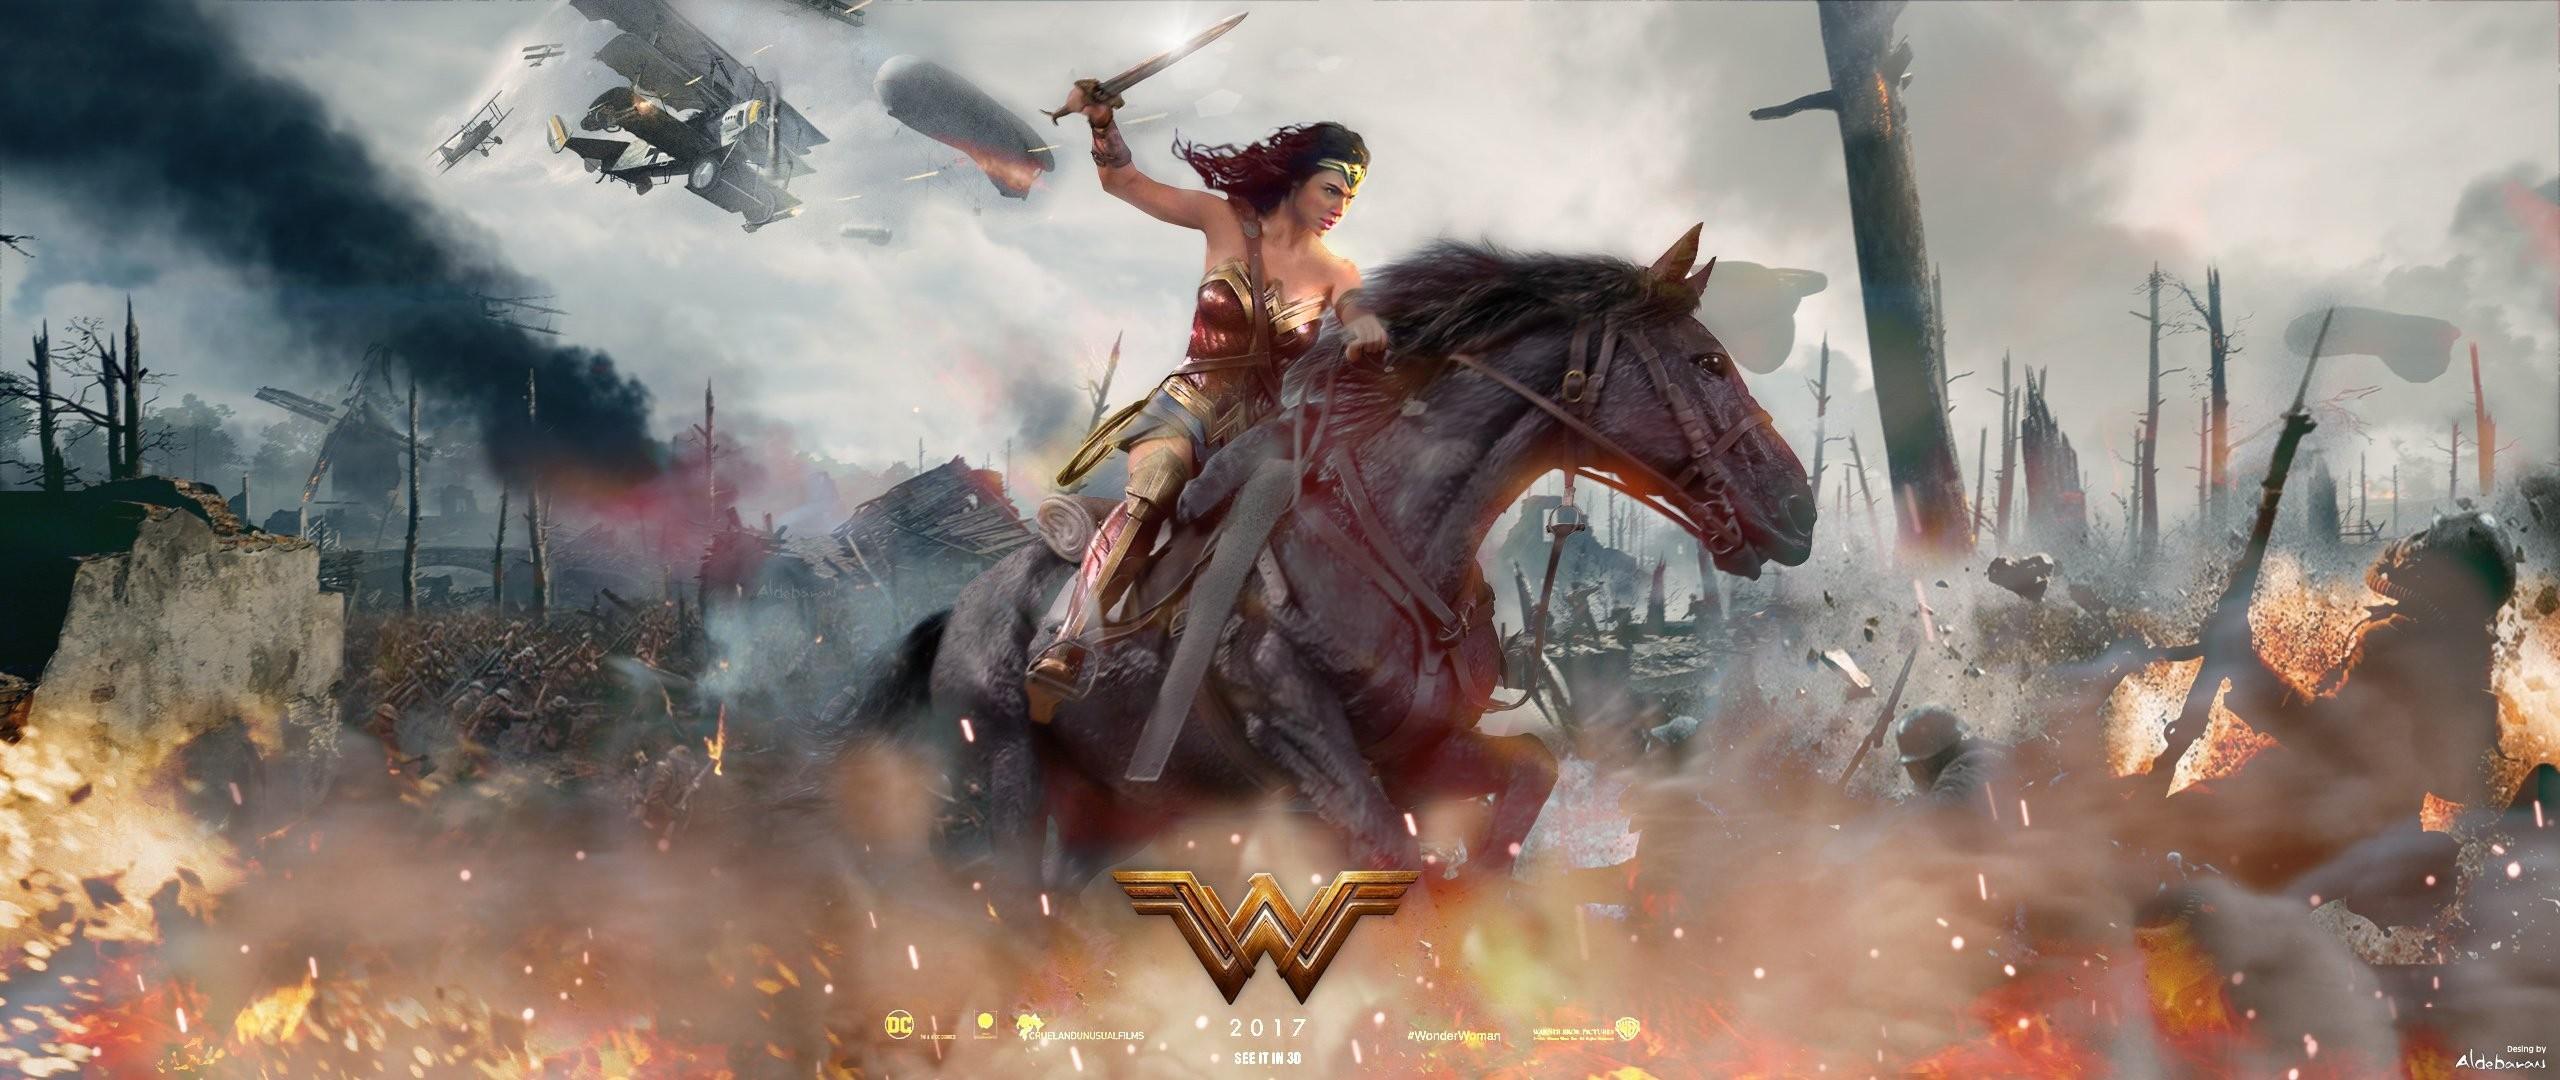 Res: 2560x1080, Gal Gadot Wonder Woman · HD Wallpaper | Background Image ID:817386